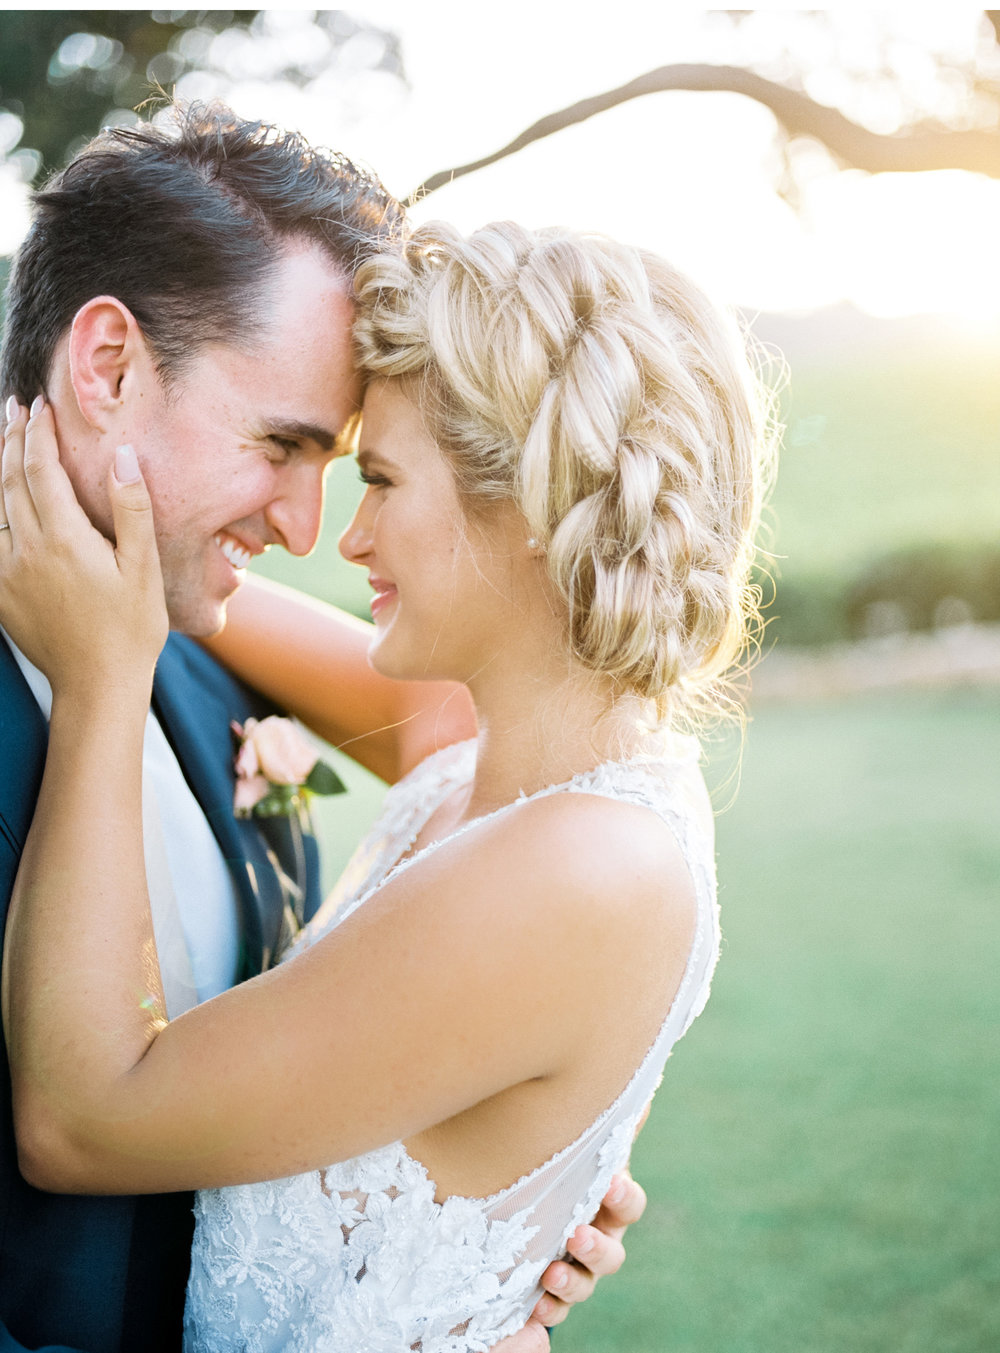 Malibu-Weddings-Natalie-Schutt-Photography_12.jpg